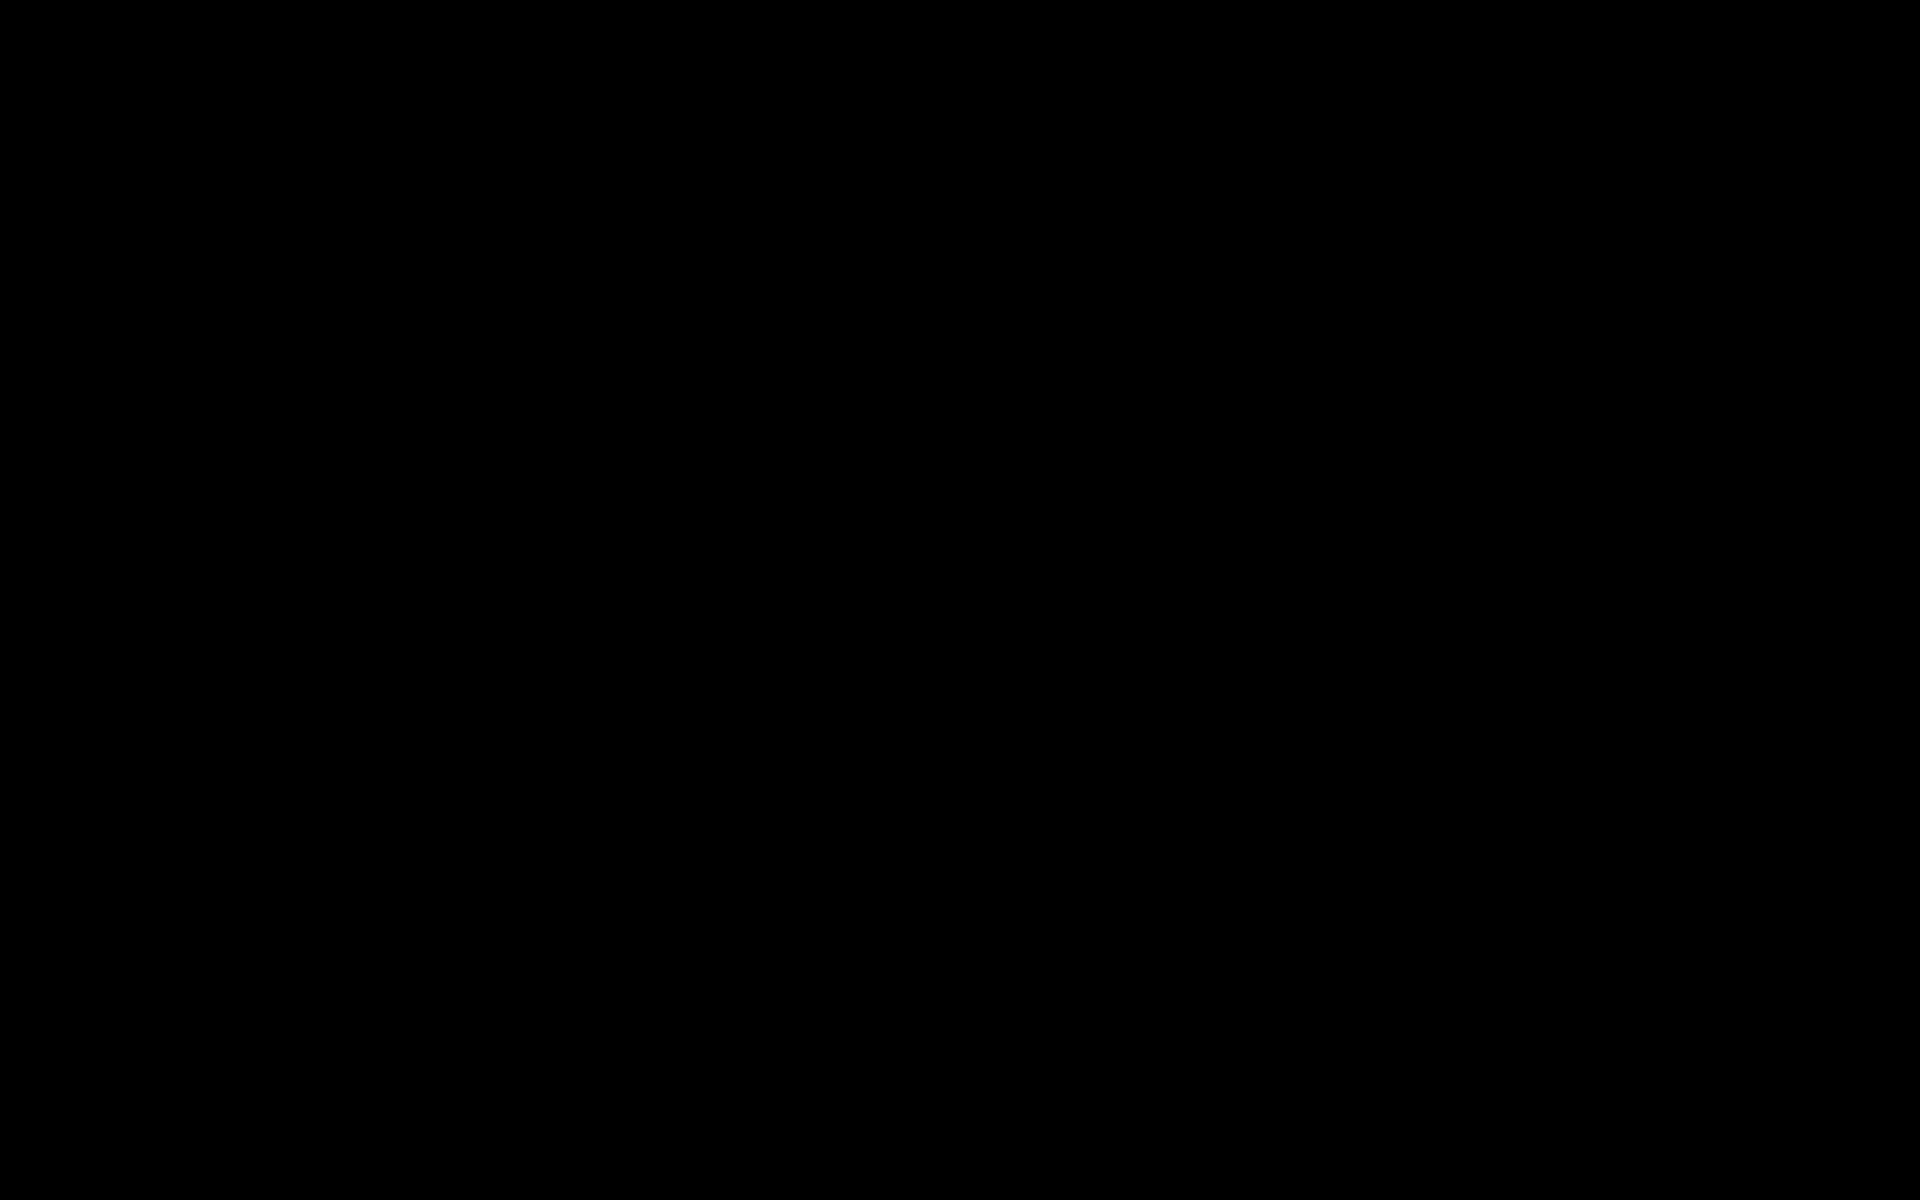 Simulated, noisygifs, StormBullet blue GIFs